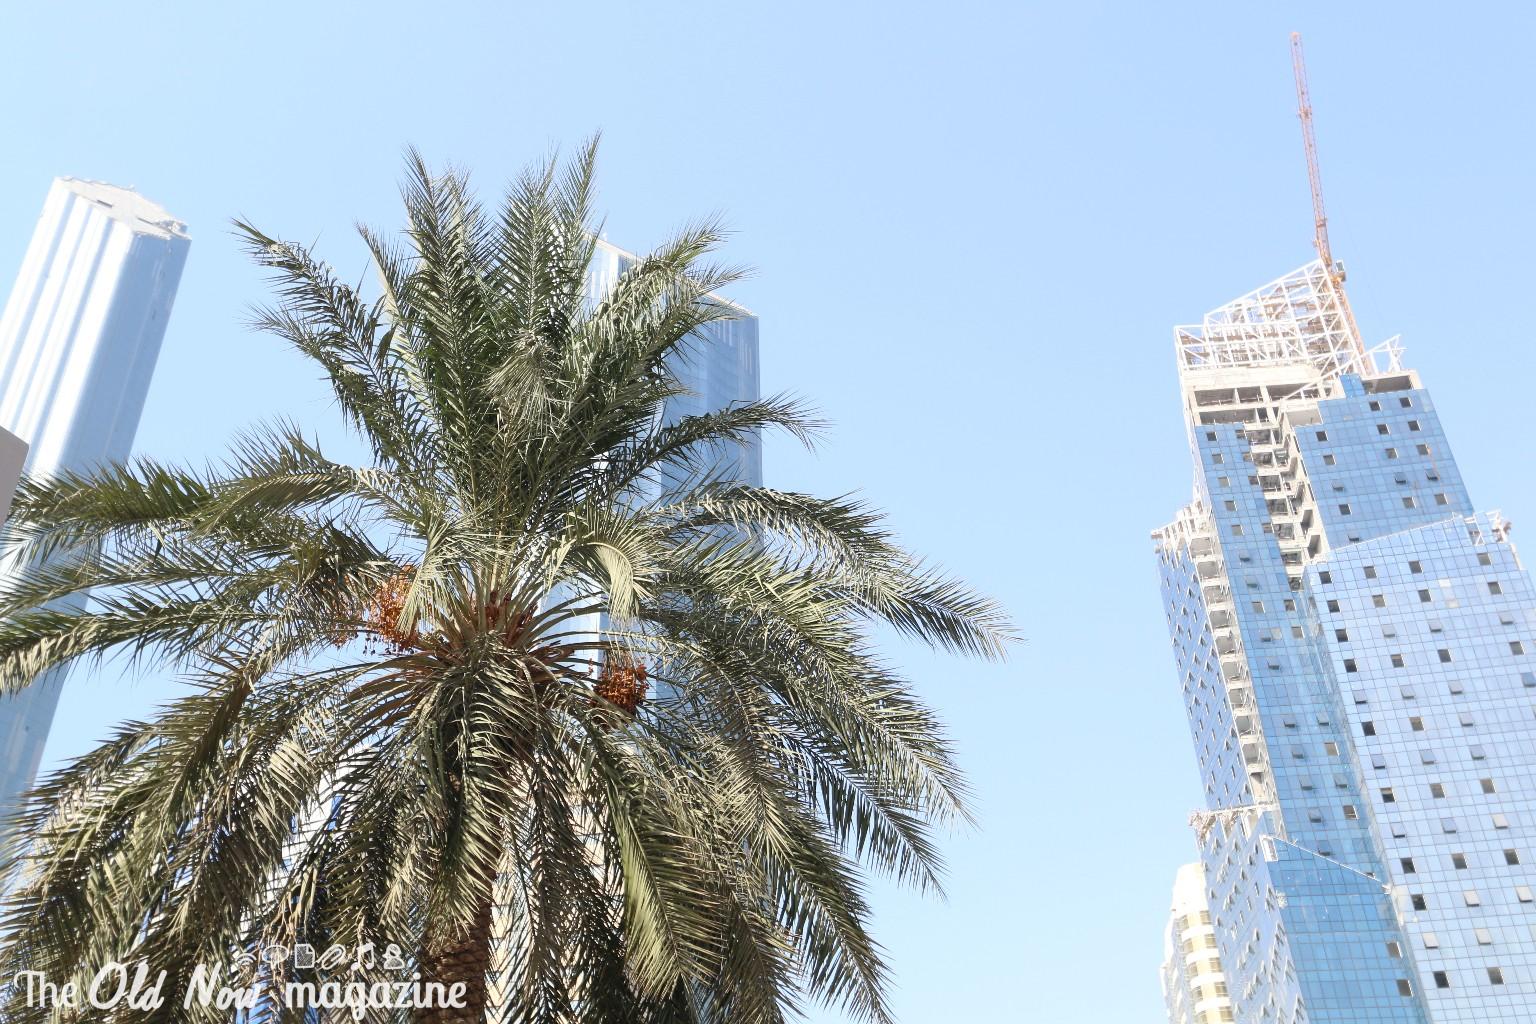 Abu Dhabi THEOLDNOW (1)